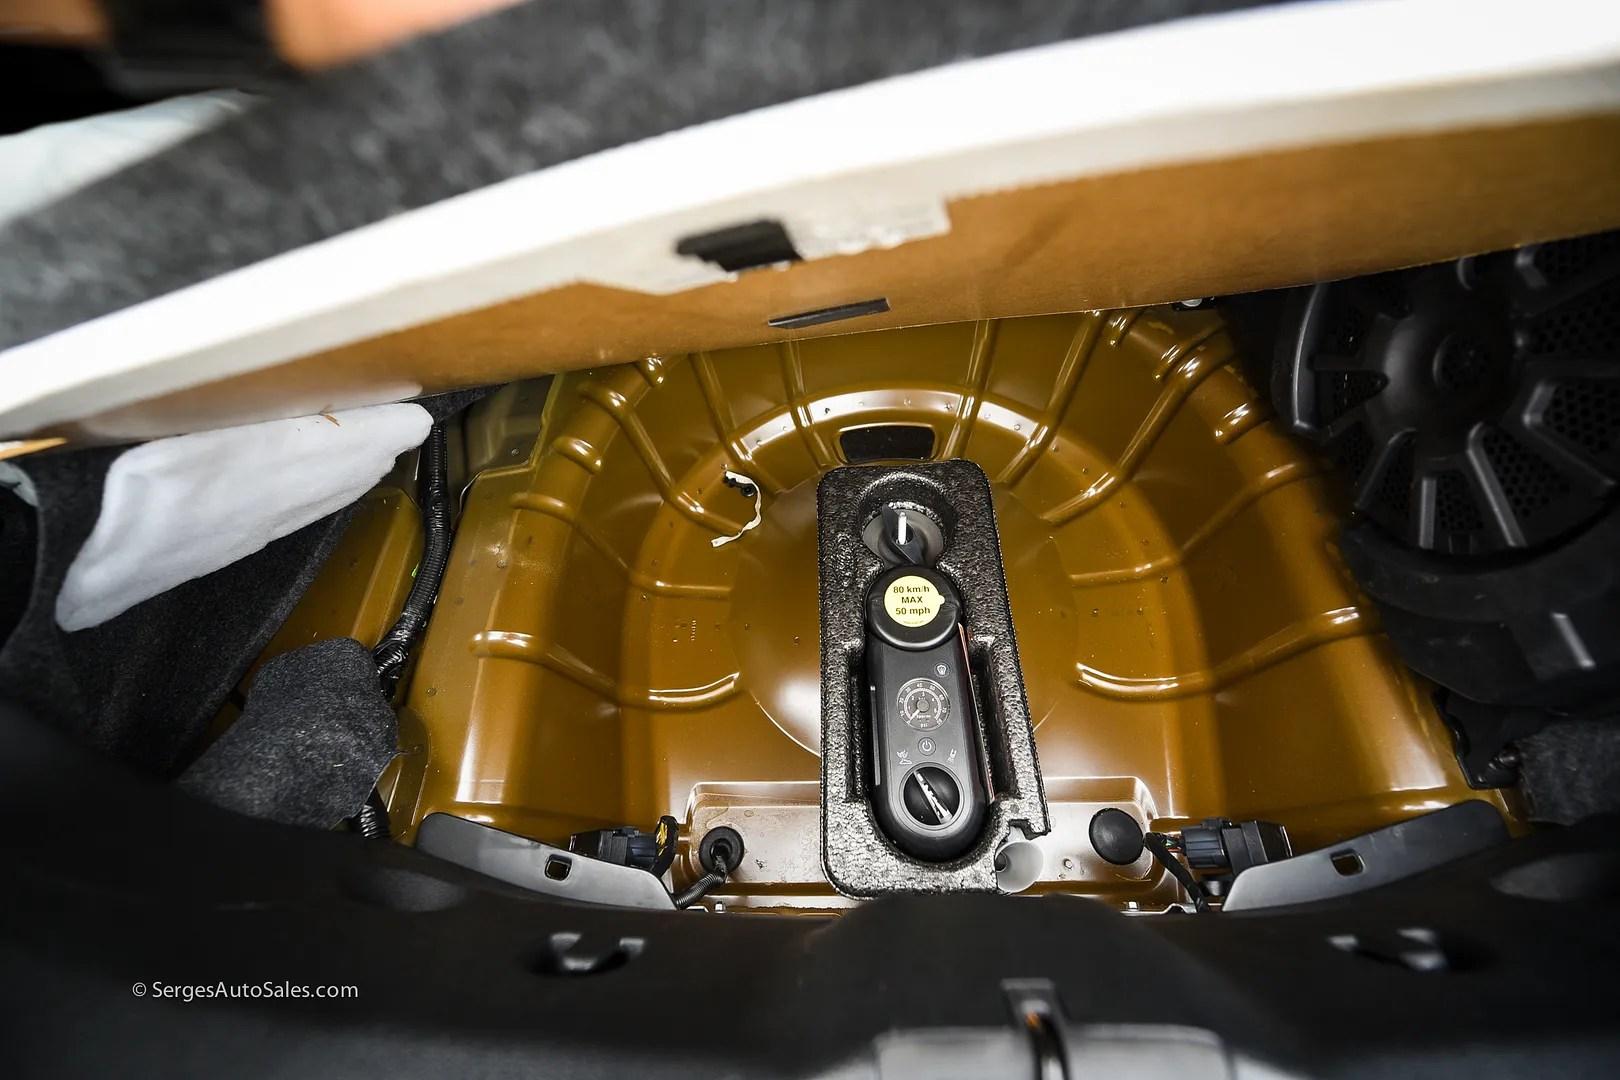 photo Serges-Auto-Sales-shelby-mustang-gt-for-sale-convertible-gt500-scranton-pa-85_zps4gjs0h8l.jpg